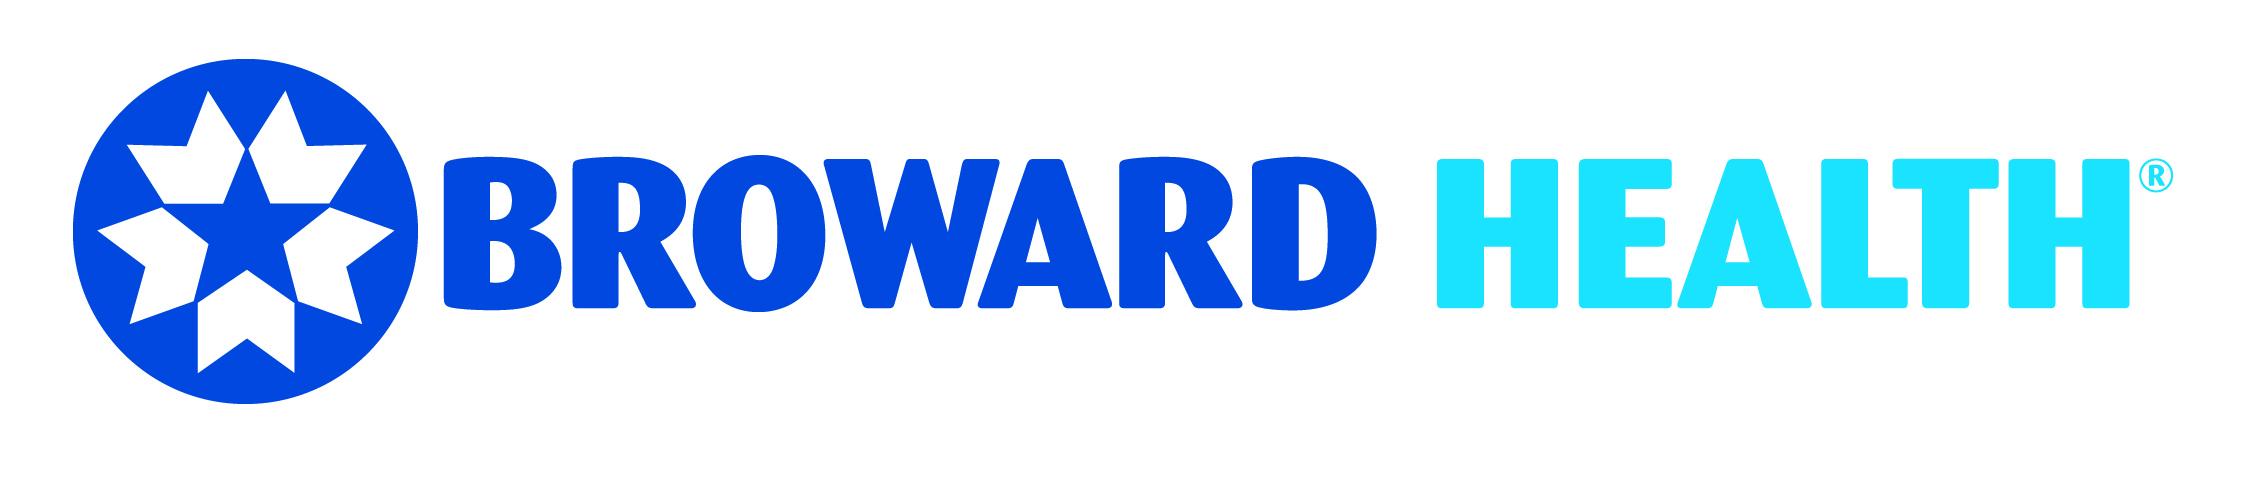 Broward Health Sponsor Logo